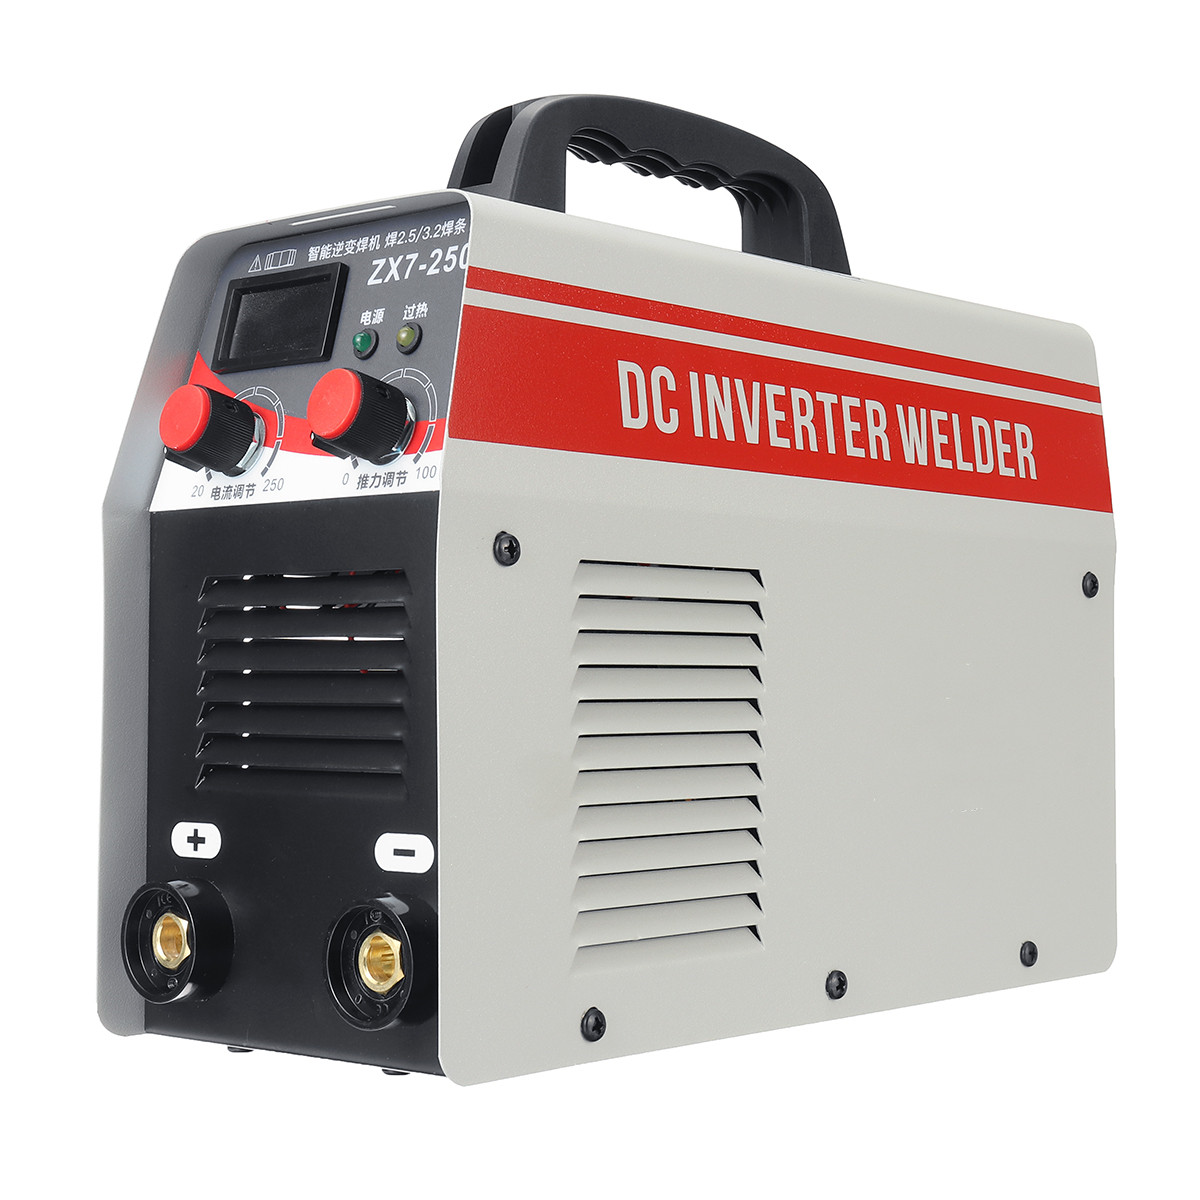 1Pcs DC Inverter Electric Welding Machine 250A Phase Welder Digital Dsplay Welding Apparatus